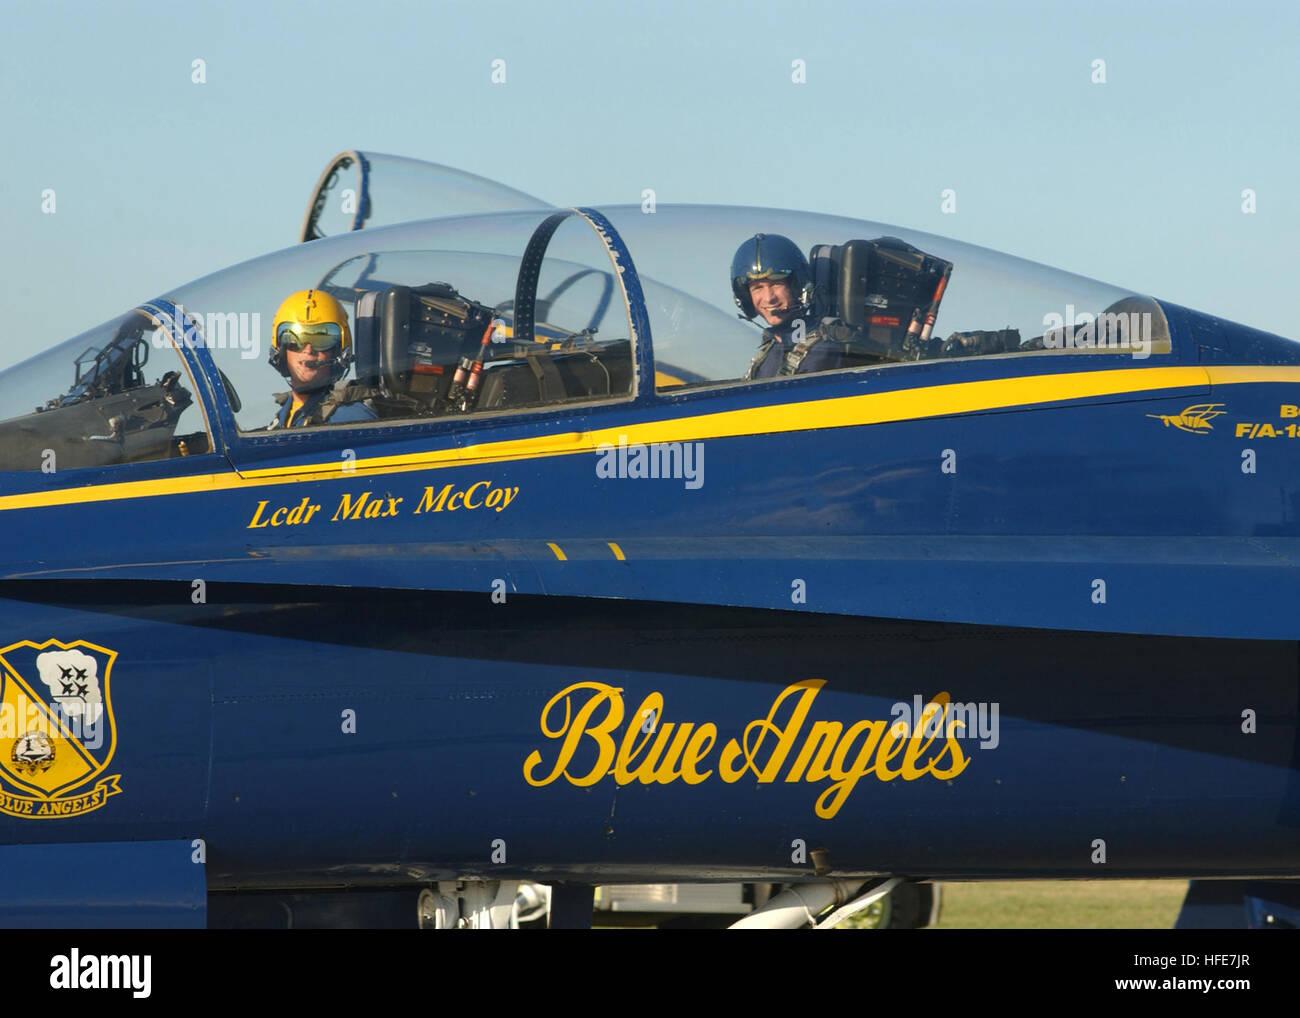 021030-N-8102J-006 Naval Air Station Jacksonville, Fla  (Oct  30